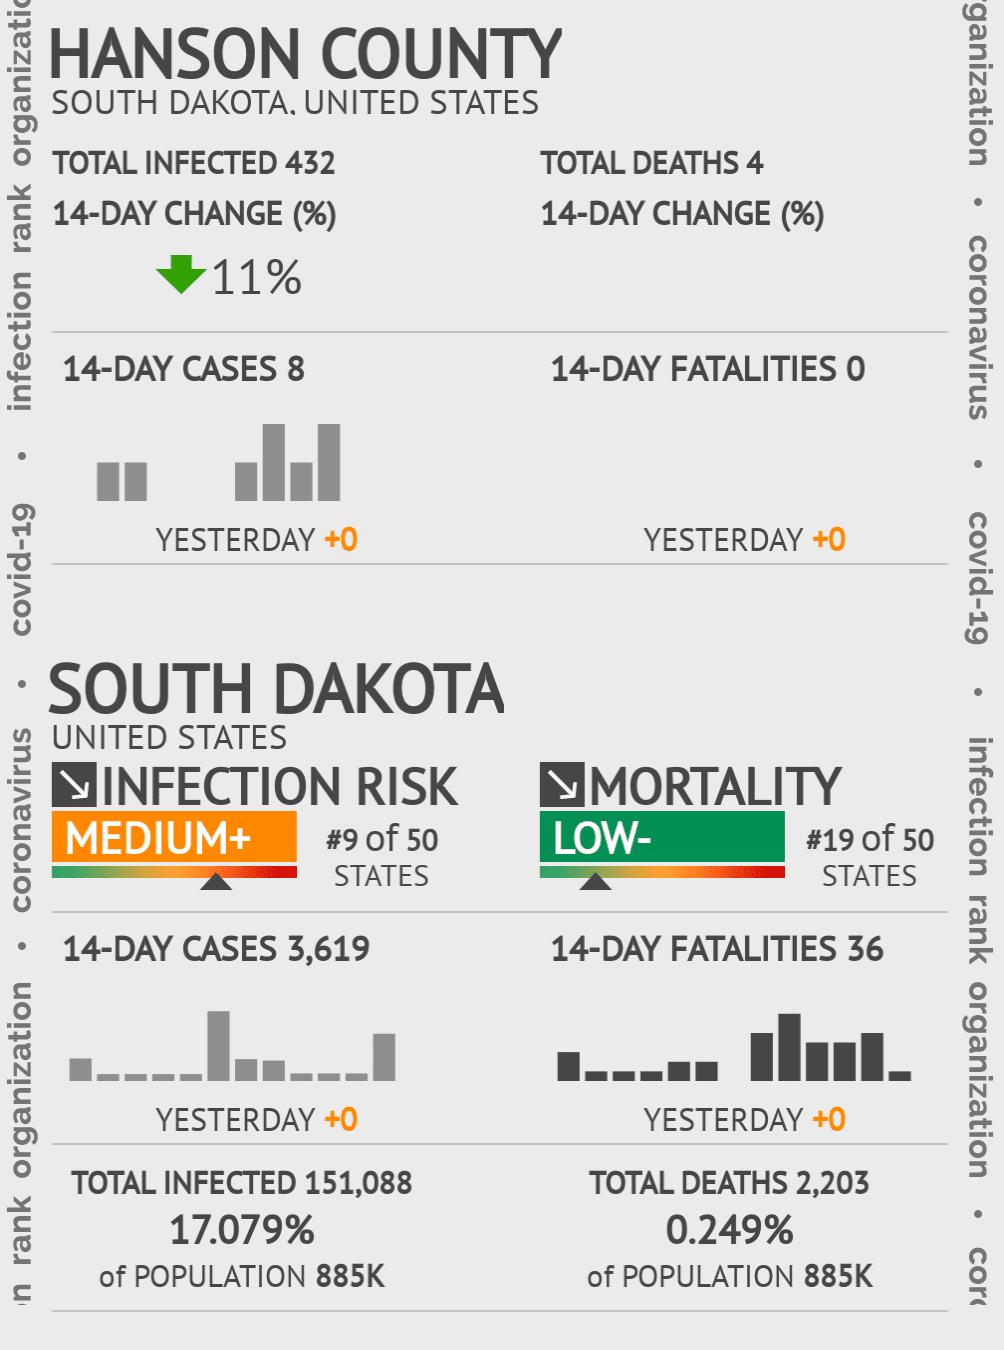 Hanson County Coronavirus Covid-19 Risk of Infection on July 24, 2021